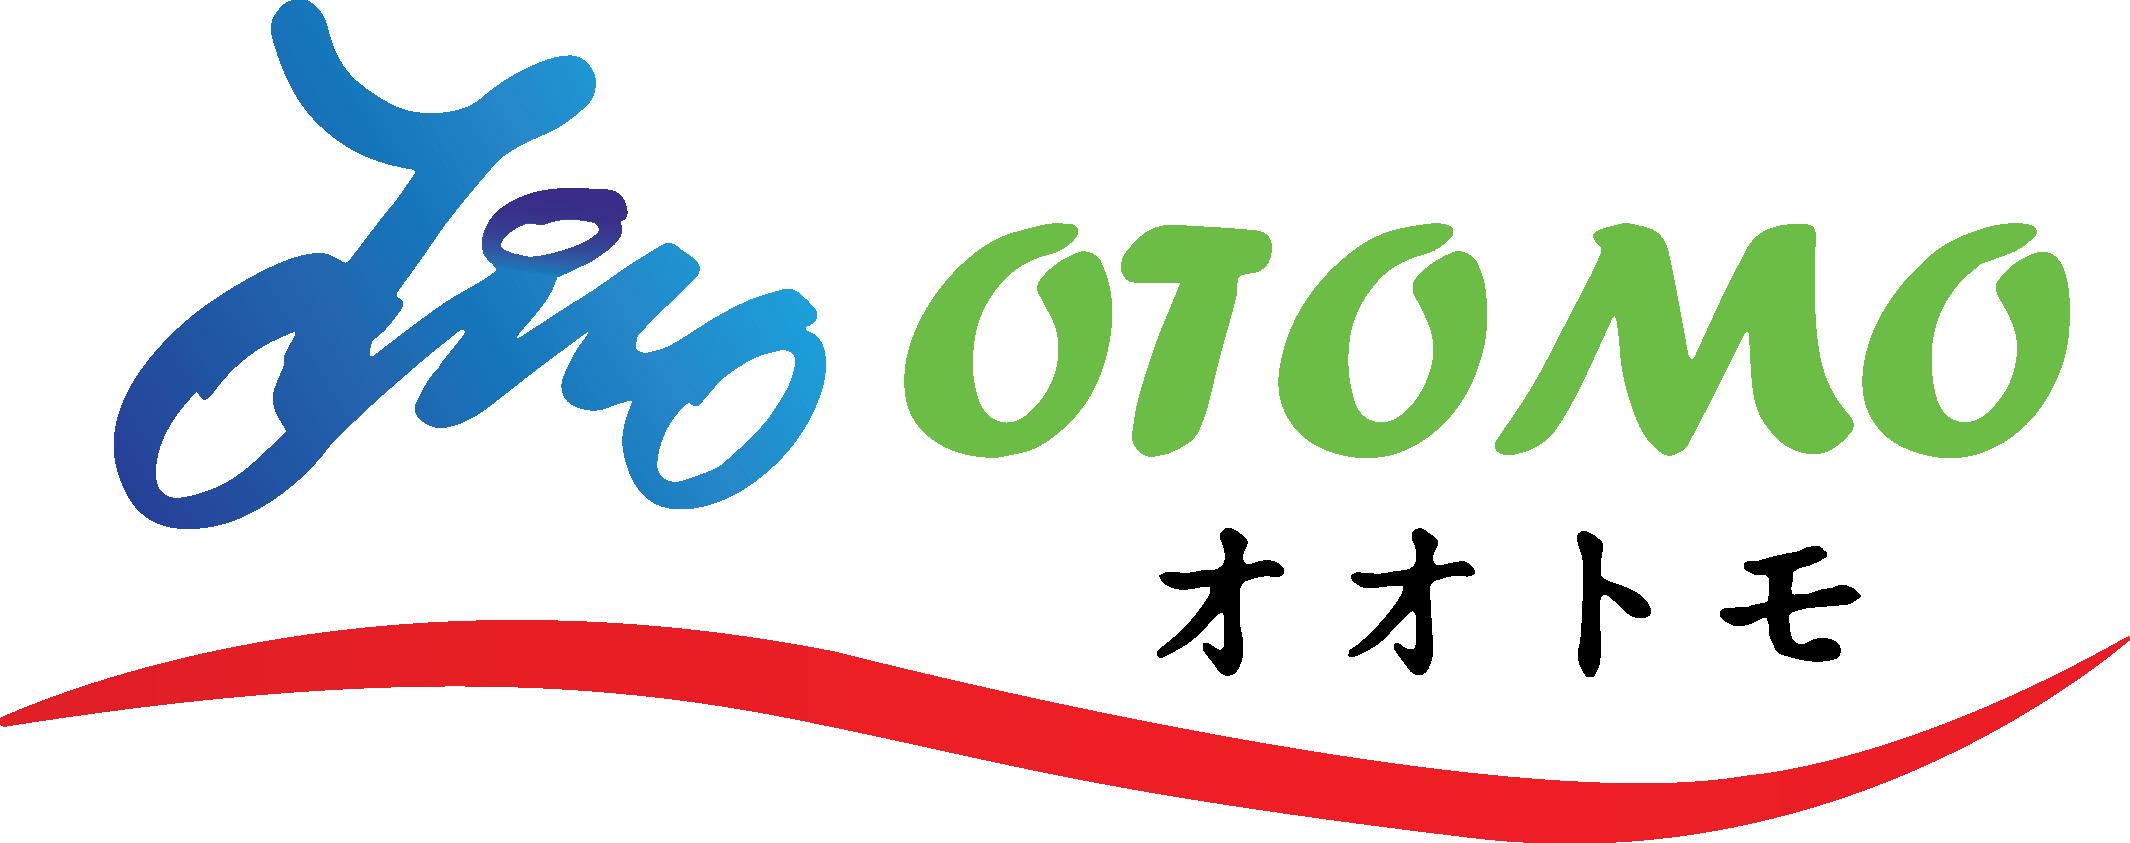 OTOMO | KUKU DUCKBILL BABY PRODUCTS